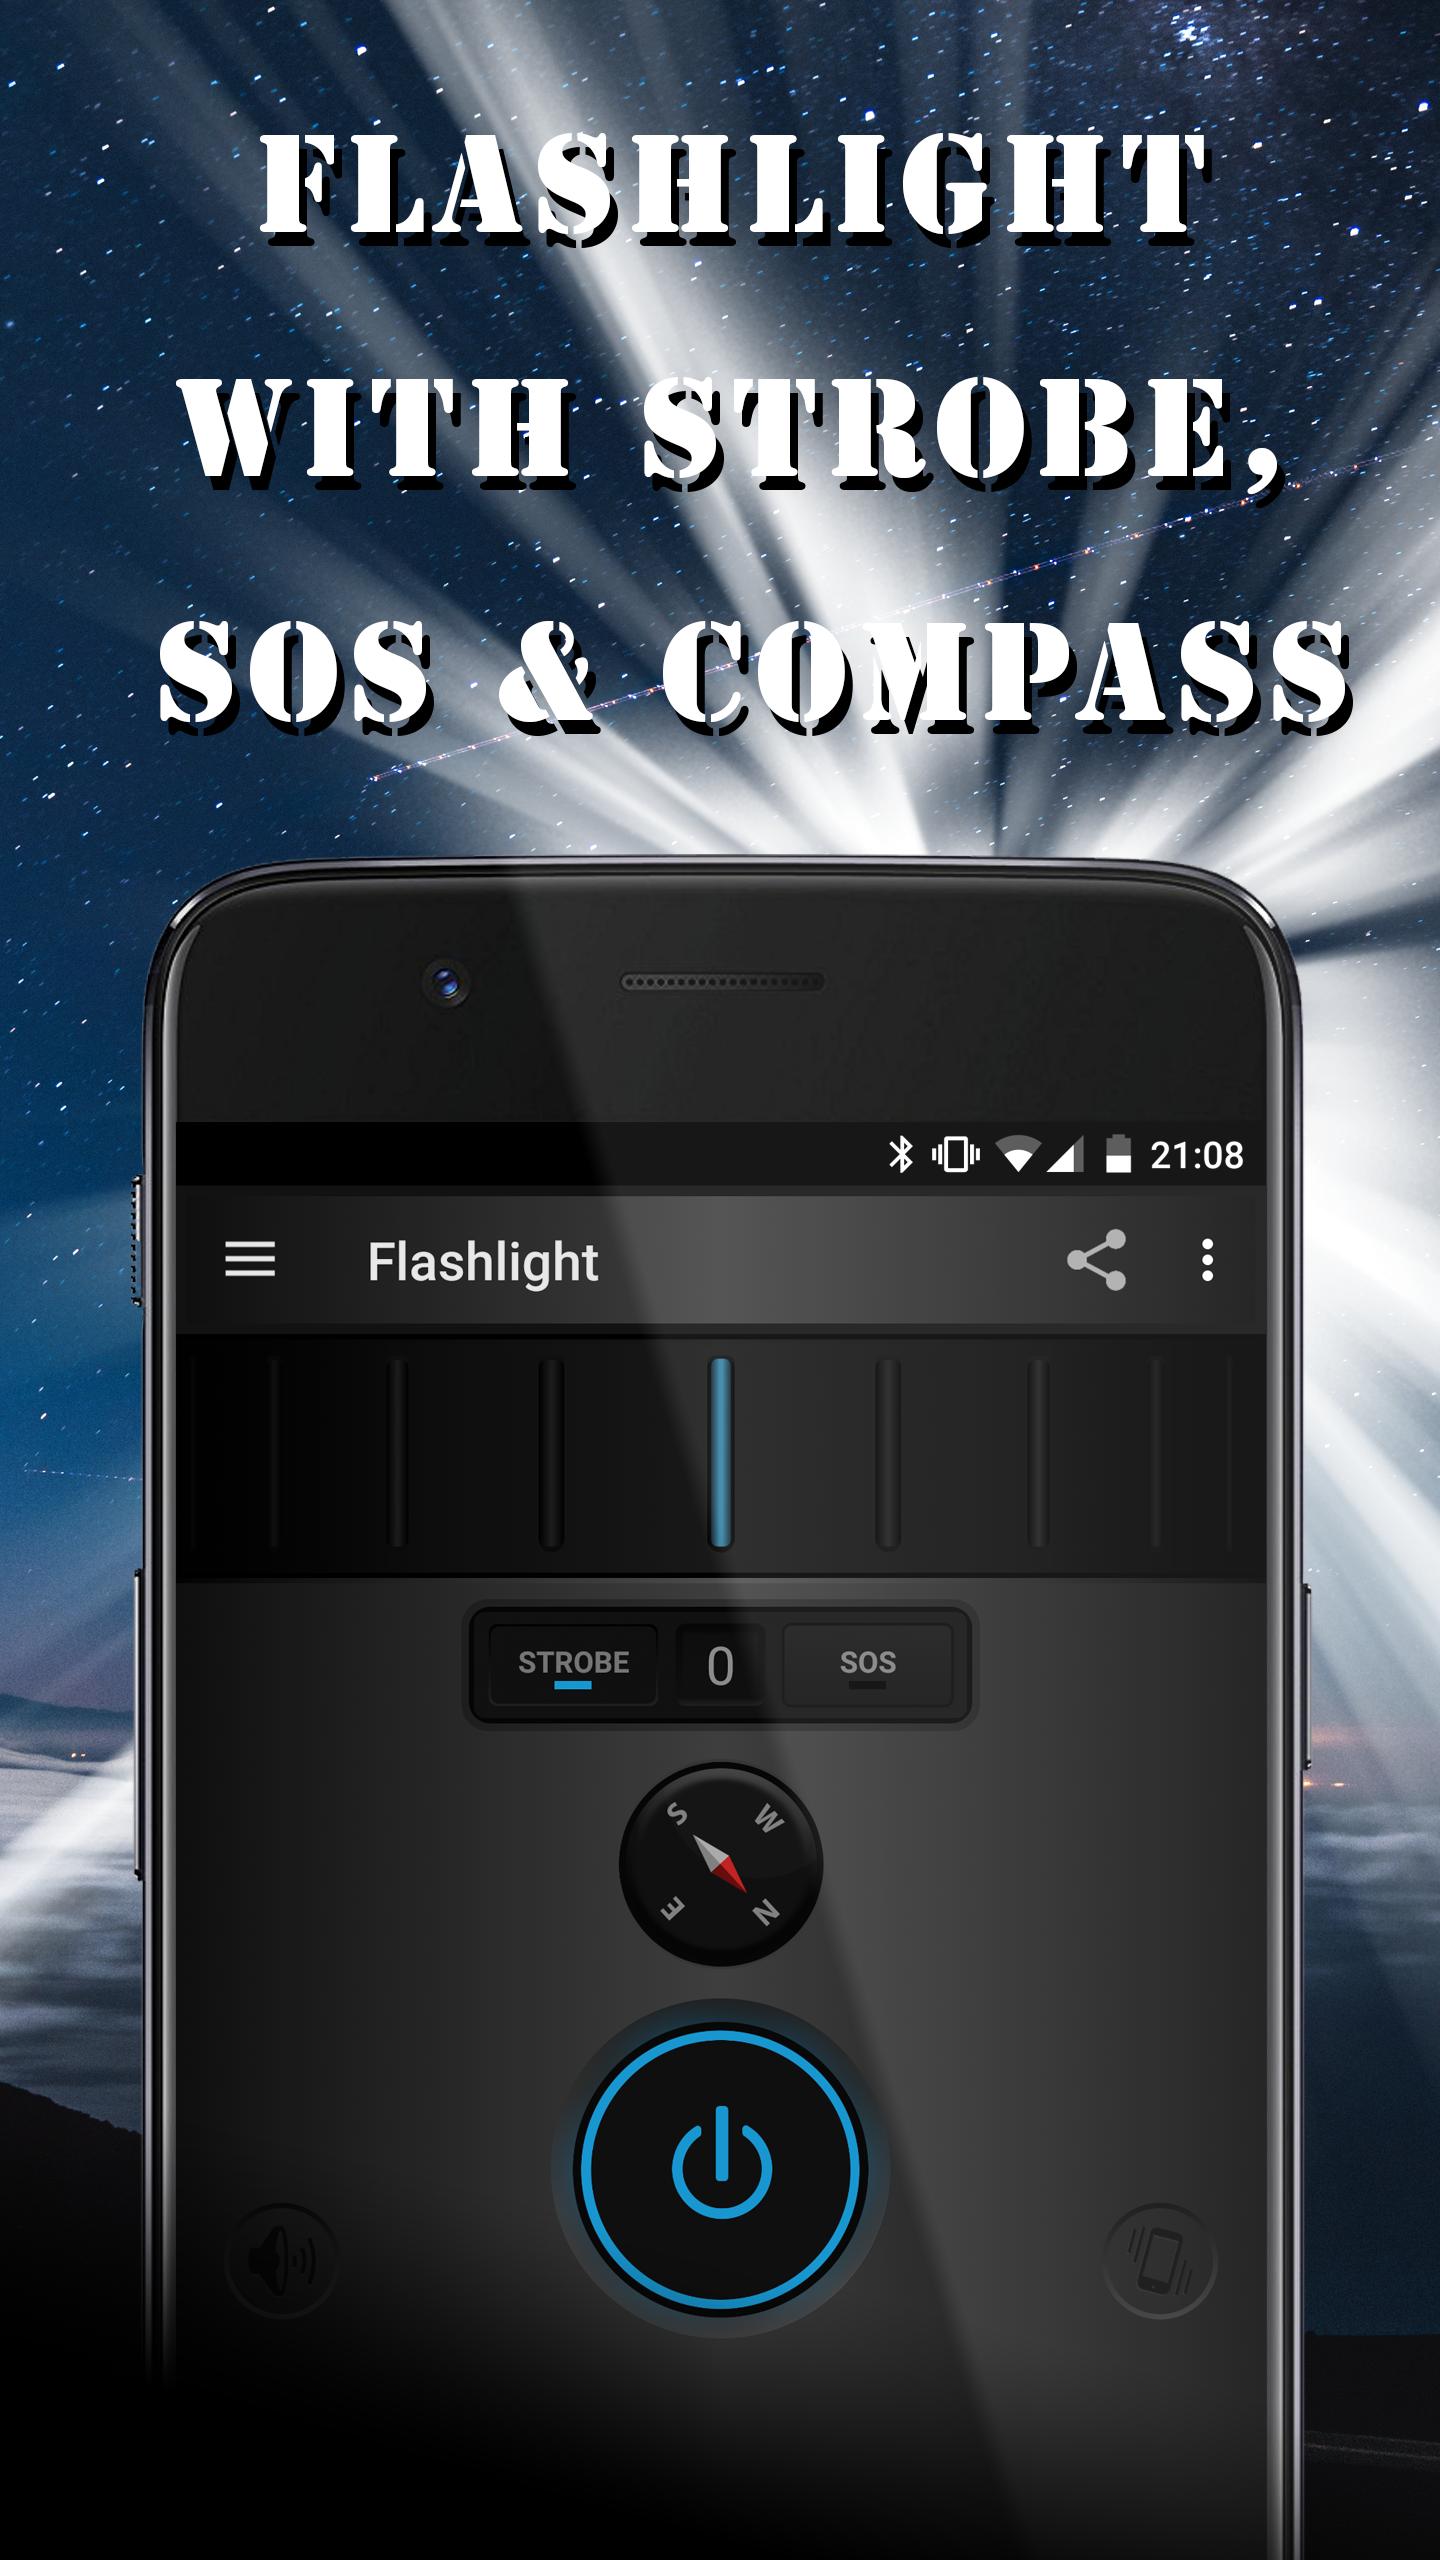 LED flashlight with strobe light, SOS & compass